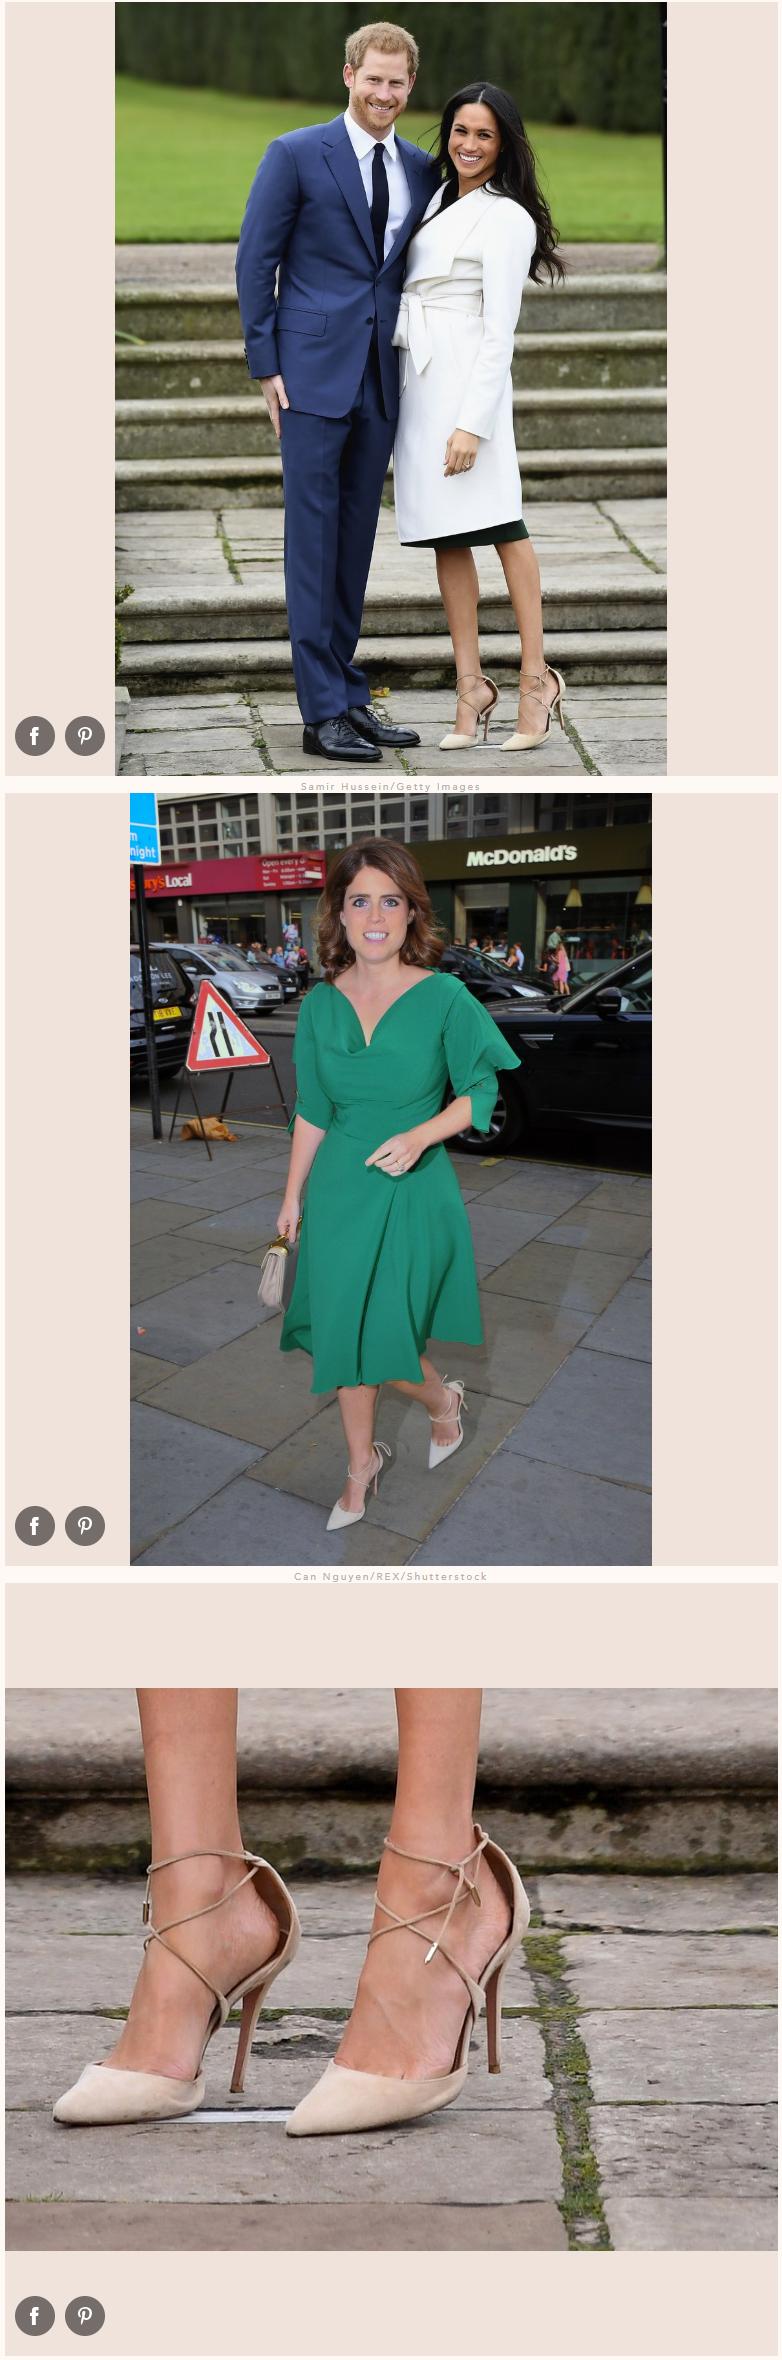 Princess Eugenie Wears Meghan Markle's Engagement Shoes